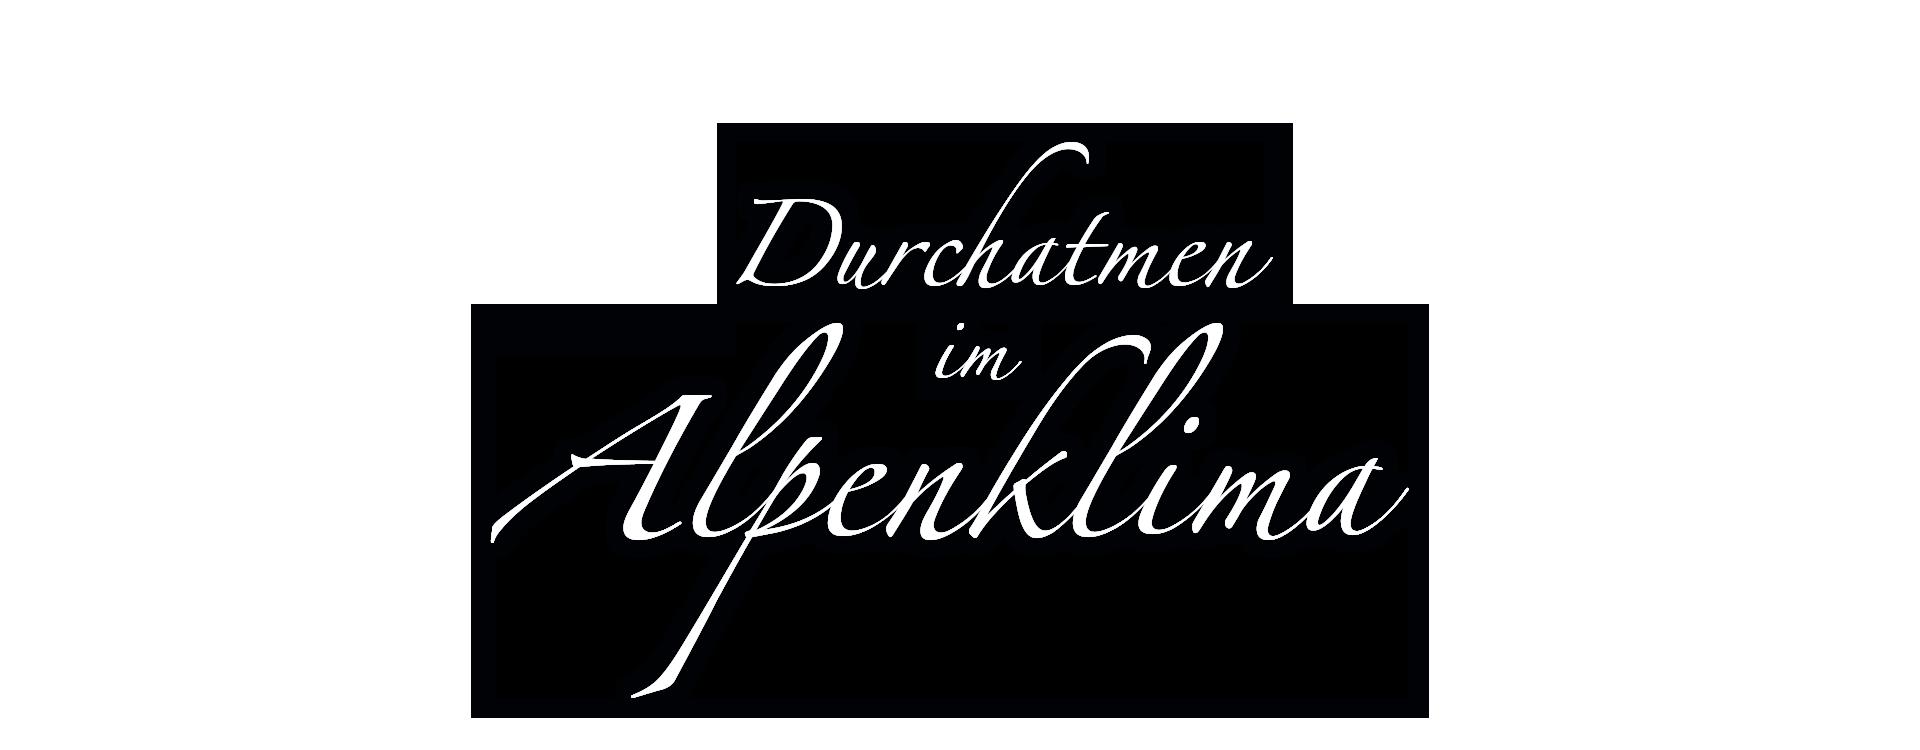 Claim Bad Reichenhall